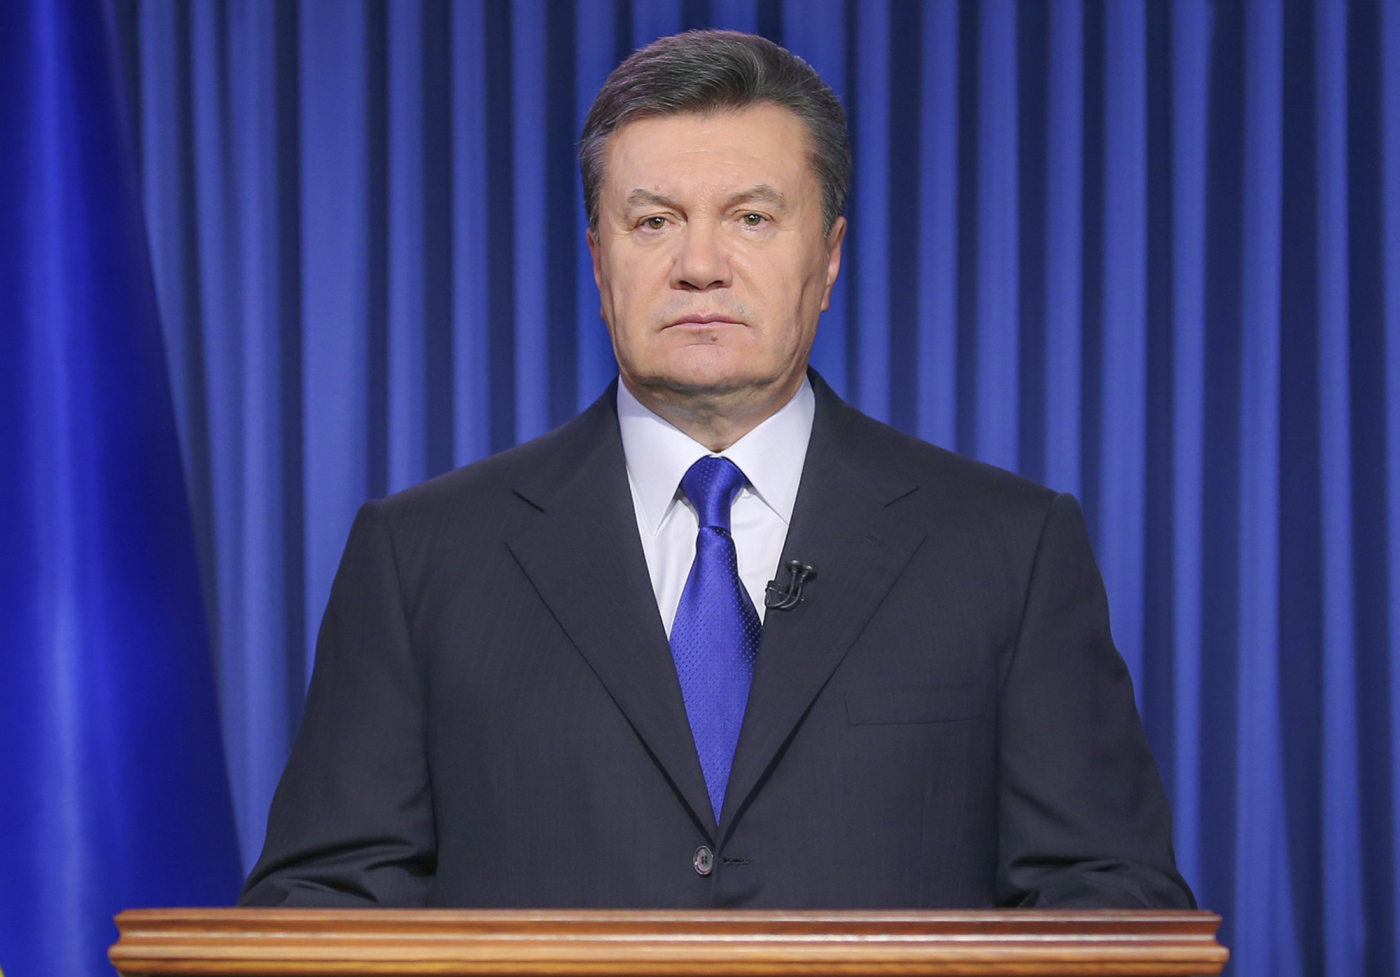 Ukrainian President Viktor Yanukovych addresses the nation on a live TV broadcast in Kiev, on Feb. 19, 2014.